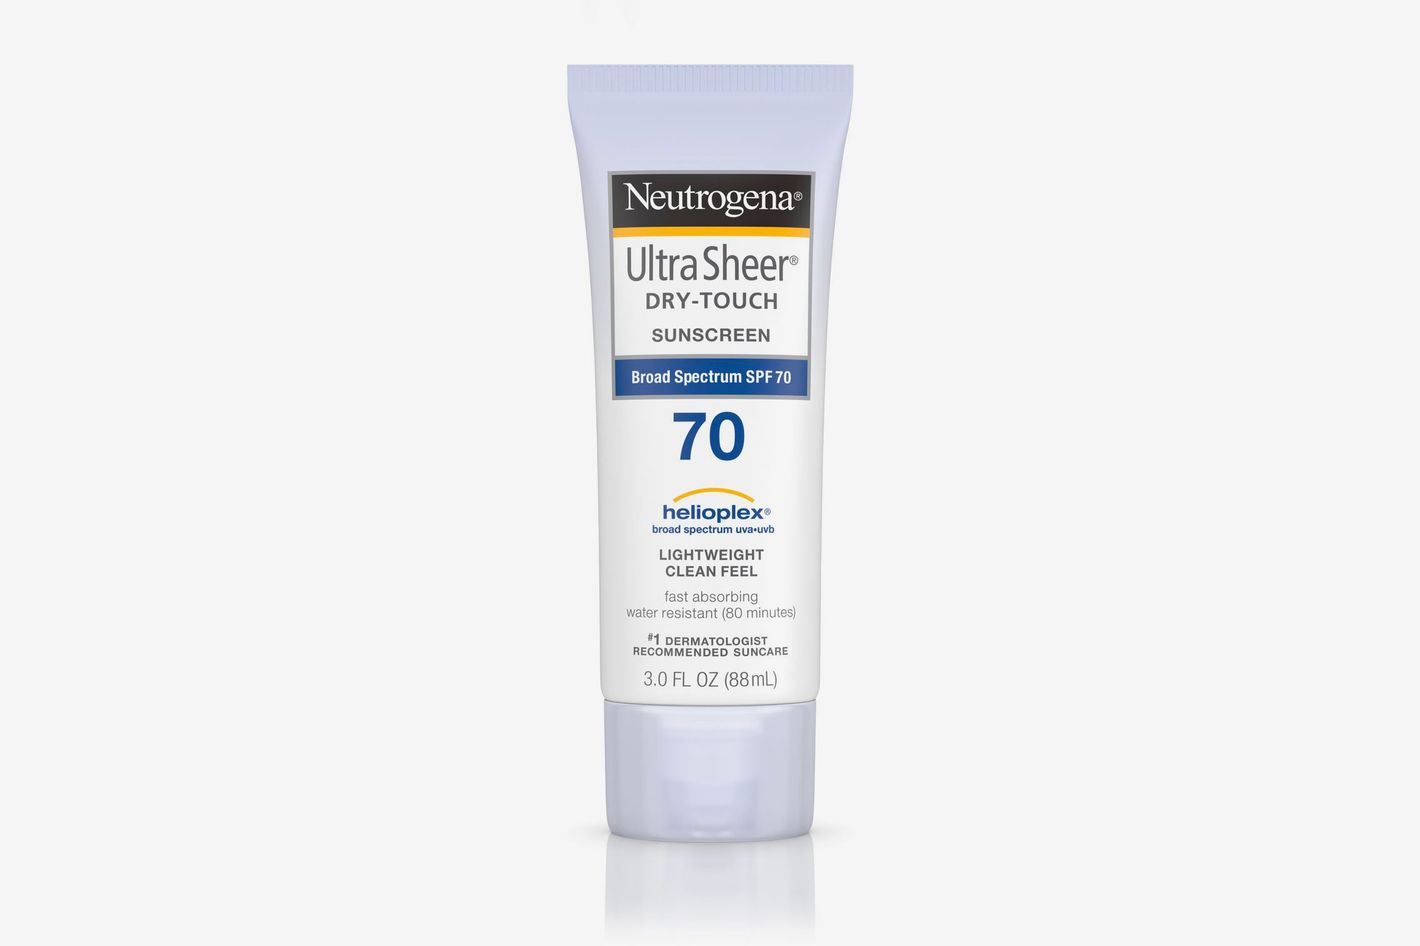 Neutrogena Ultra Sheer Liquid Sunscreen